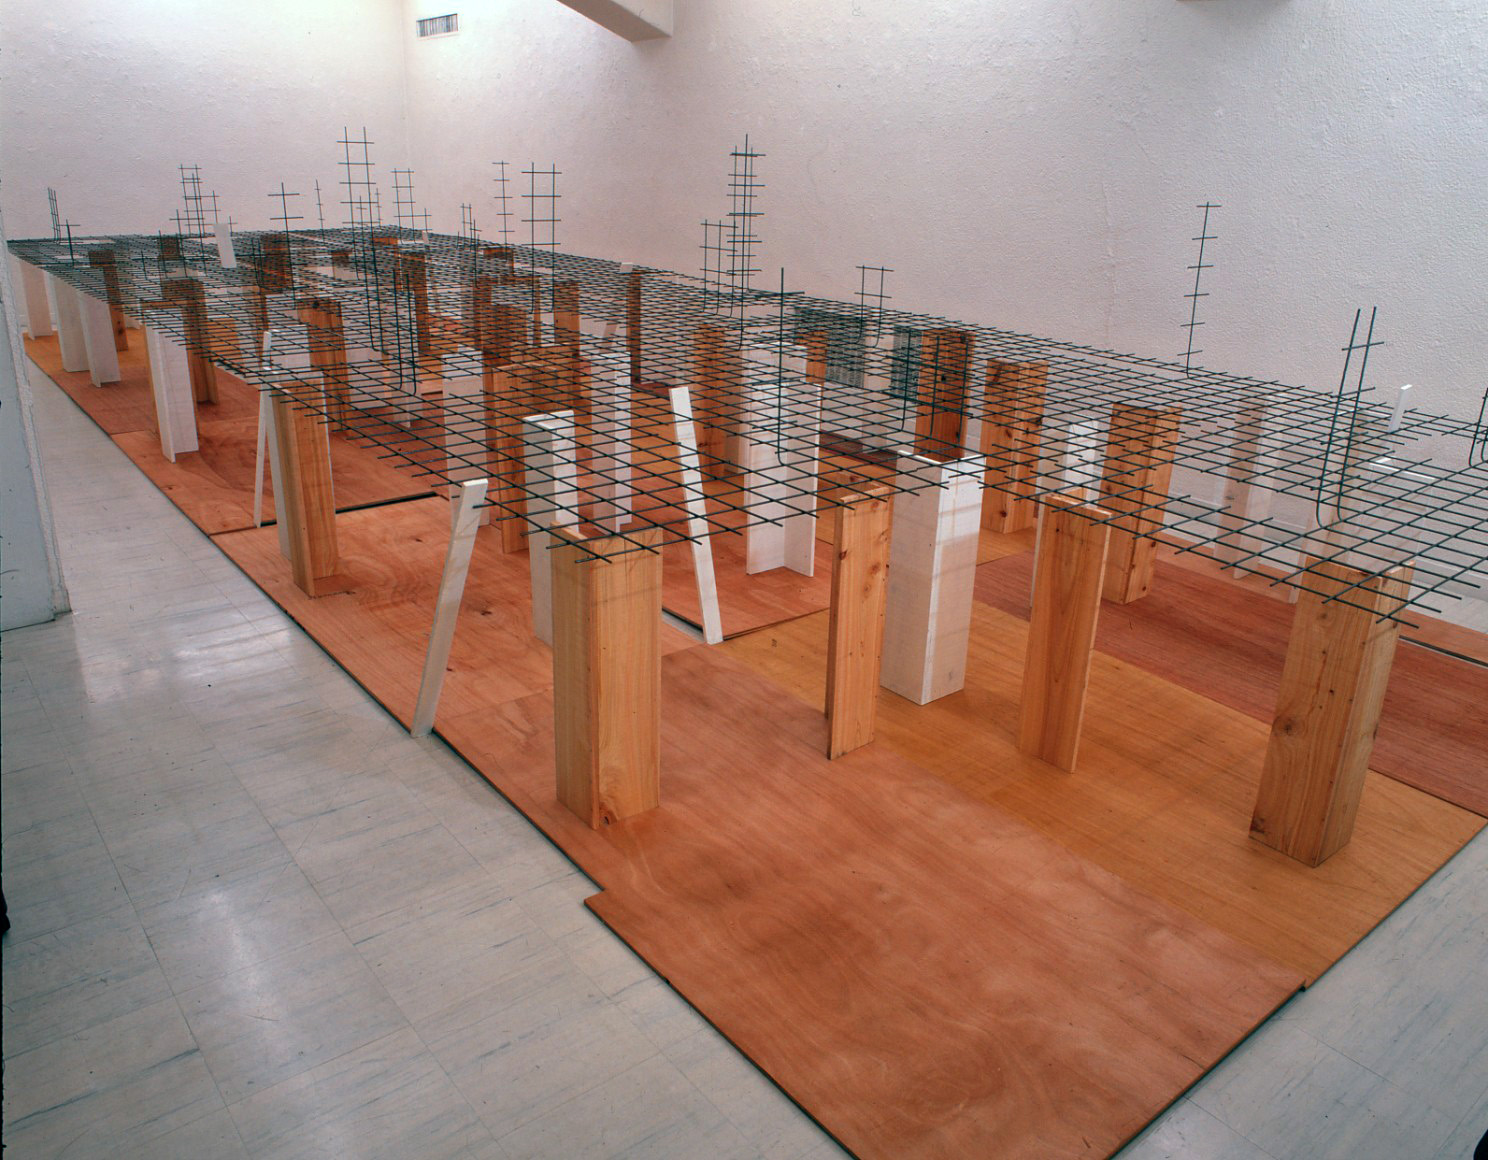 Disseminating Territory , 1996 領域を敷く ( Ryōiki wo Shiku ) Wood, paint, wire mesh 153 x 300 x 900 cm Installation view, Tokyo Gallery, Tokyo, 1996 Courtesy Tokyo Gallery + BTAP